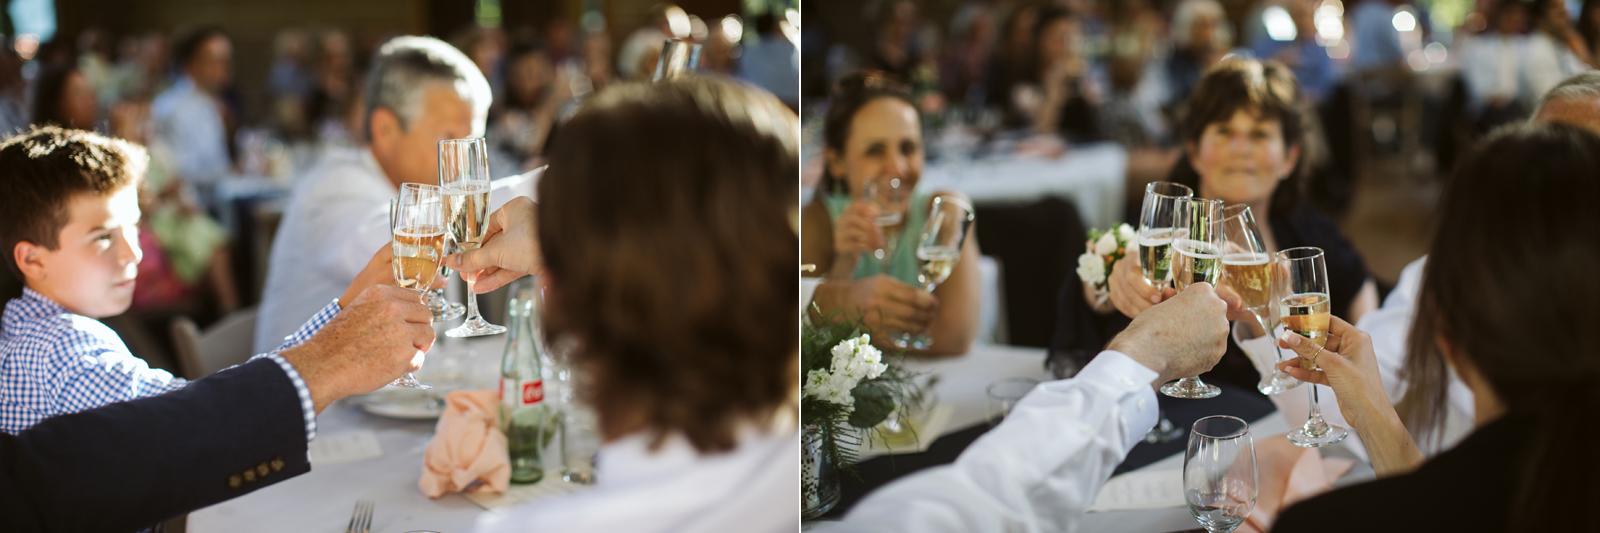 096-daronjackson-rachel-michael-wedding-mtpisgah.jpg